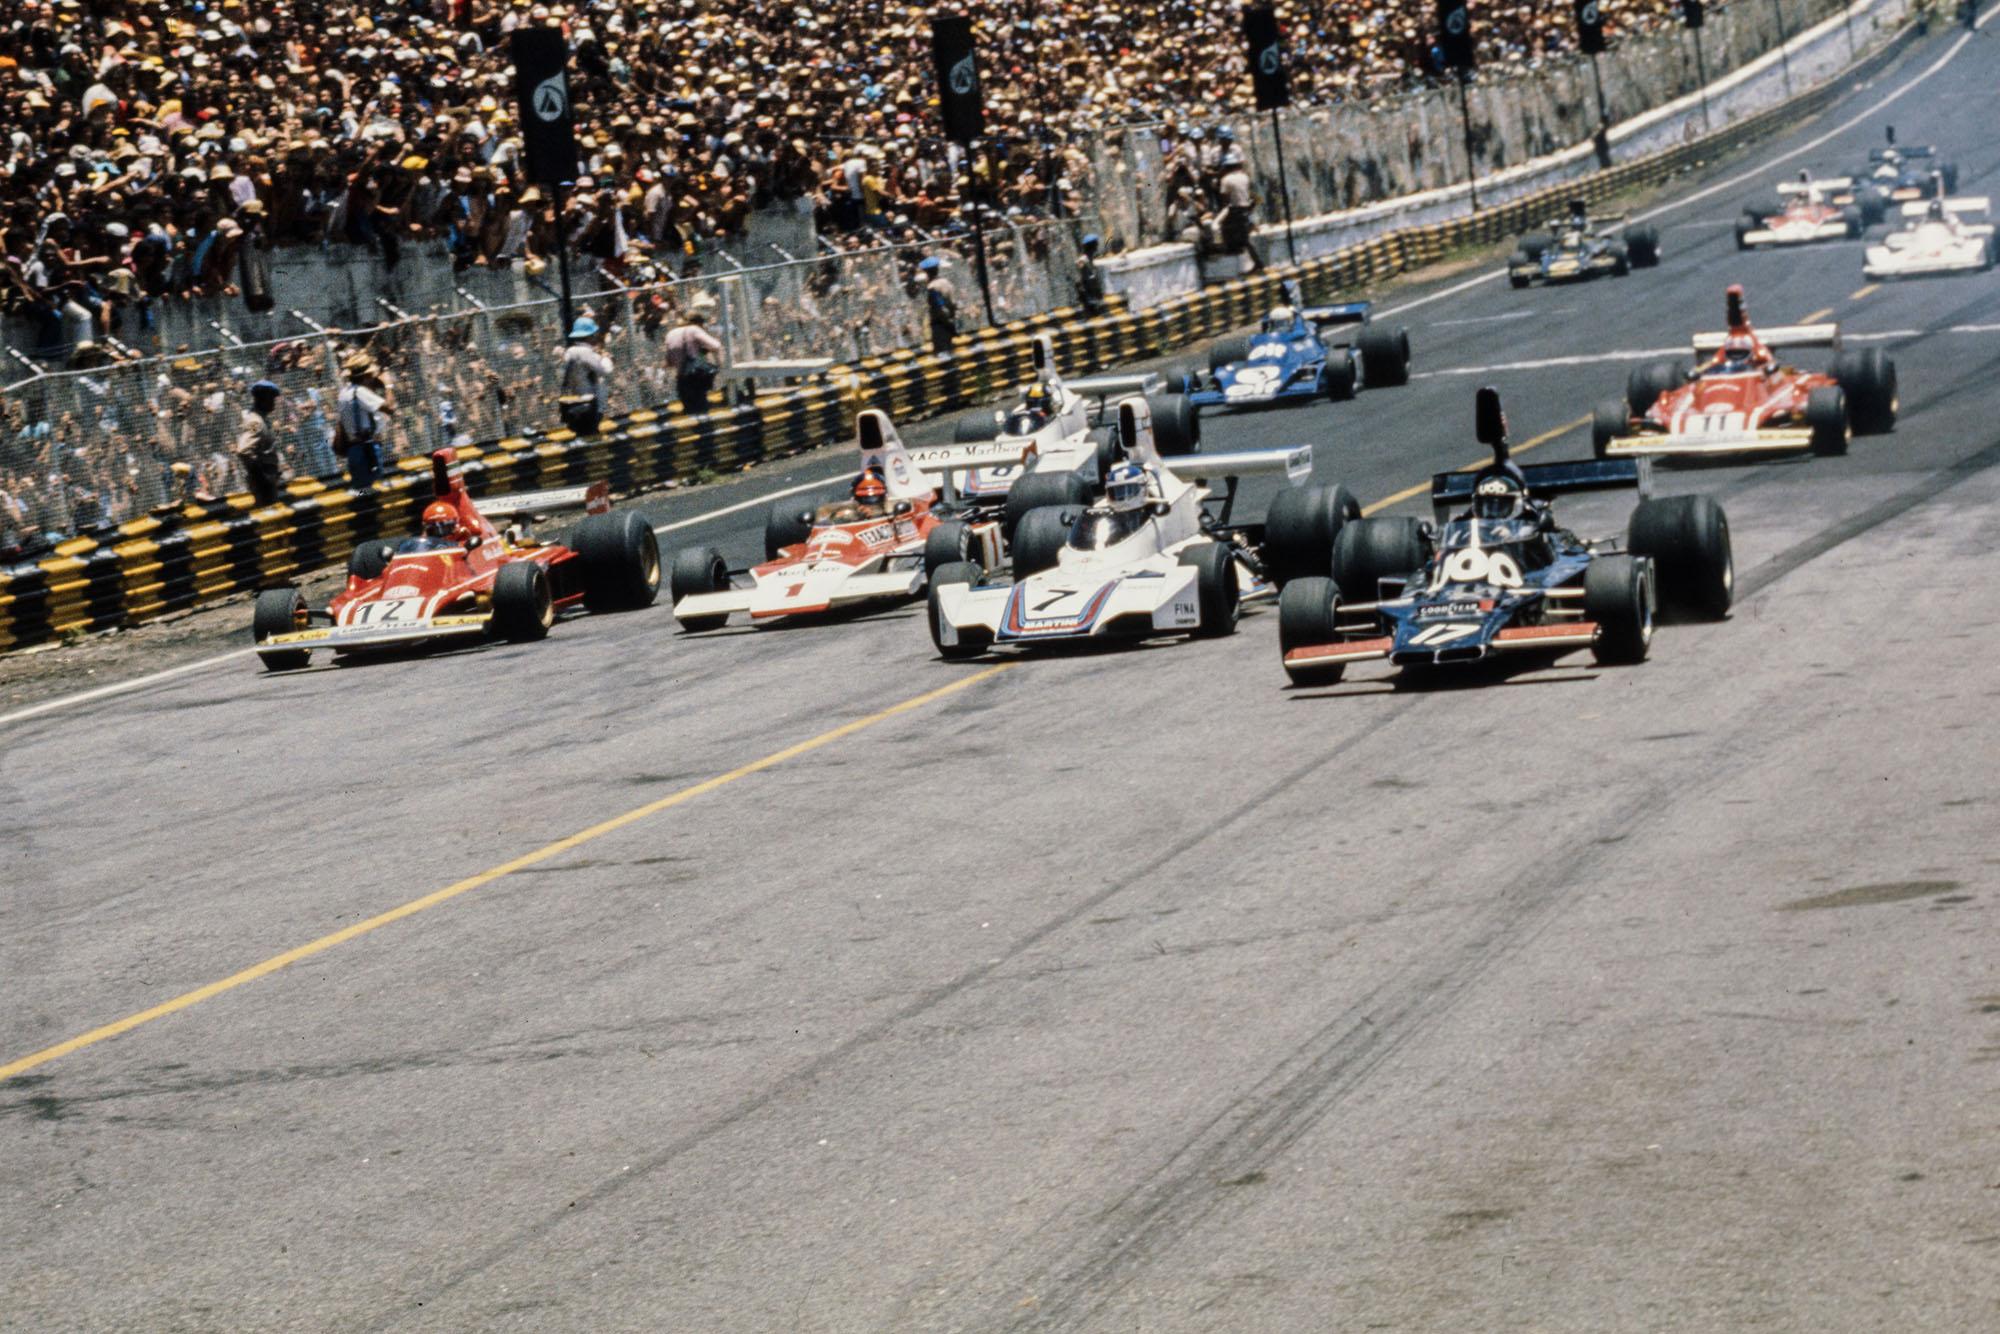 (From right) Jean-Pierre Jarier heads Carlos Pace, Emerson Fittipaldi and Niki Lauda at the 1975 Brazailian Grand Prix, Interlagos.